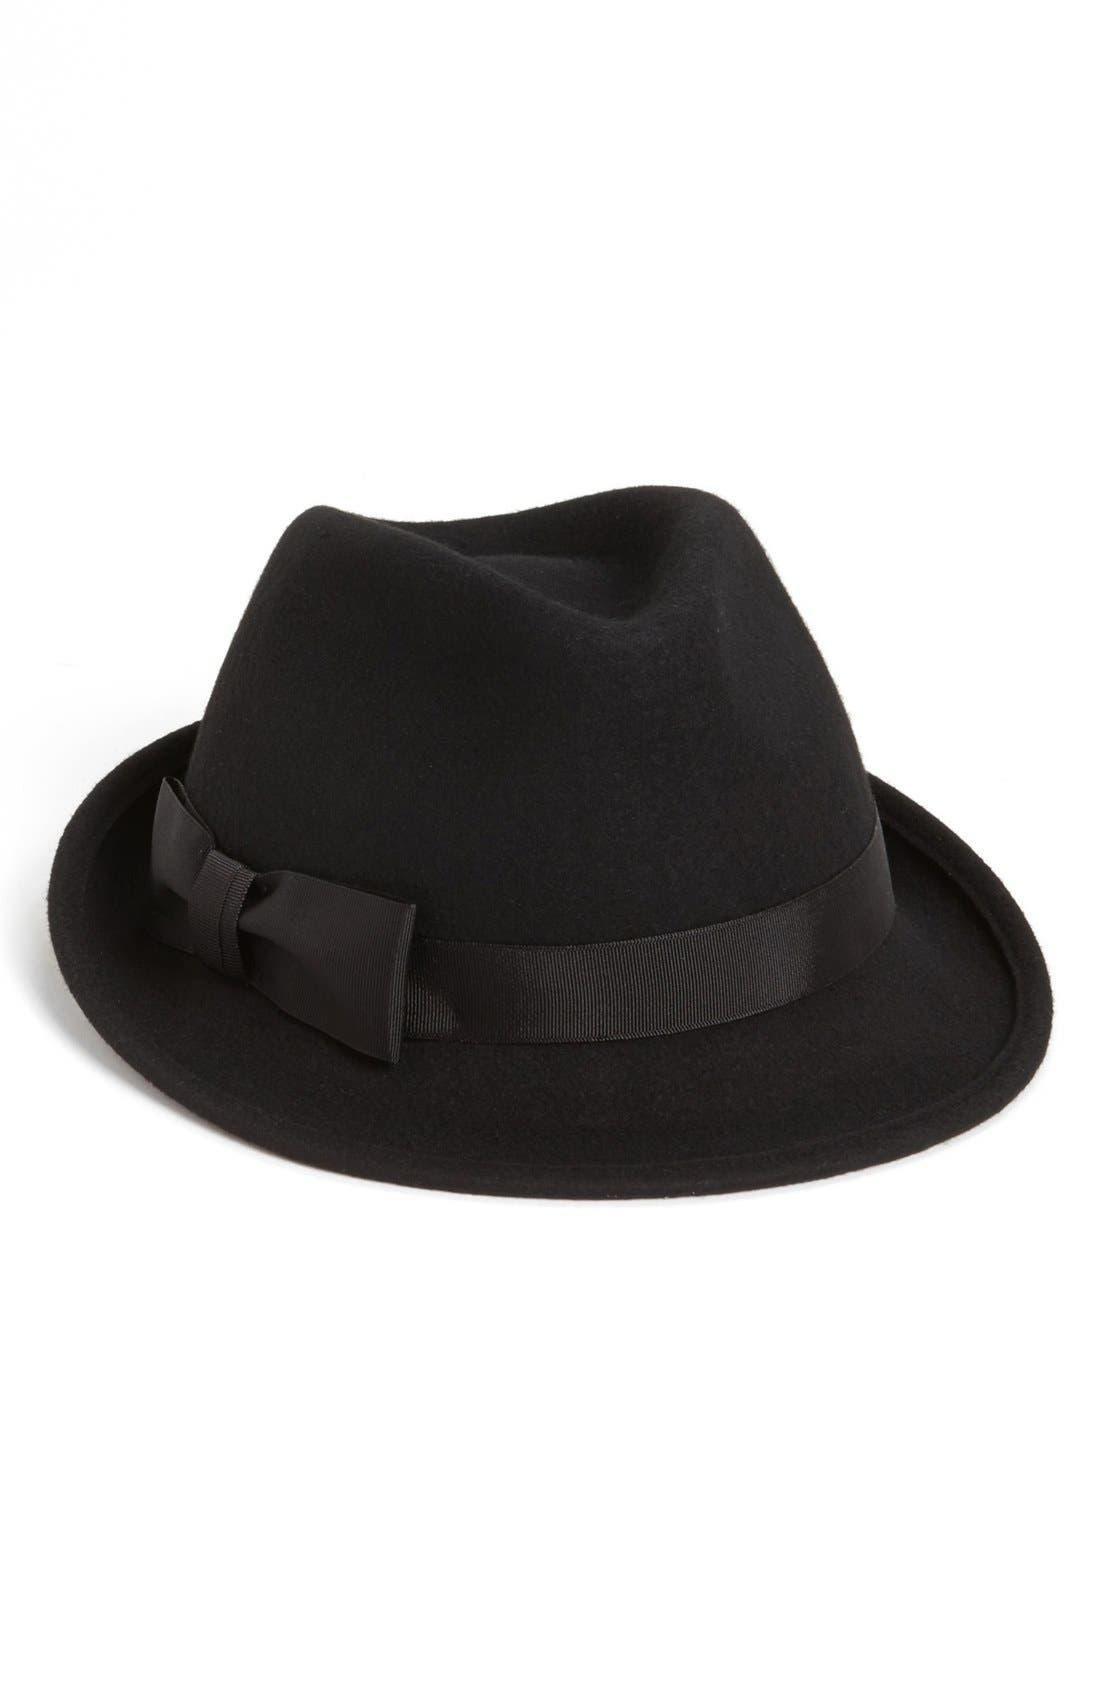 Alternate Image 2  - Nordstrom Wool Felt Trilby Hat